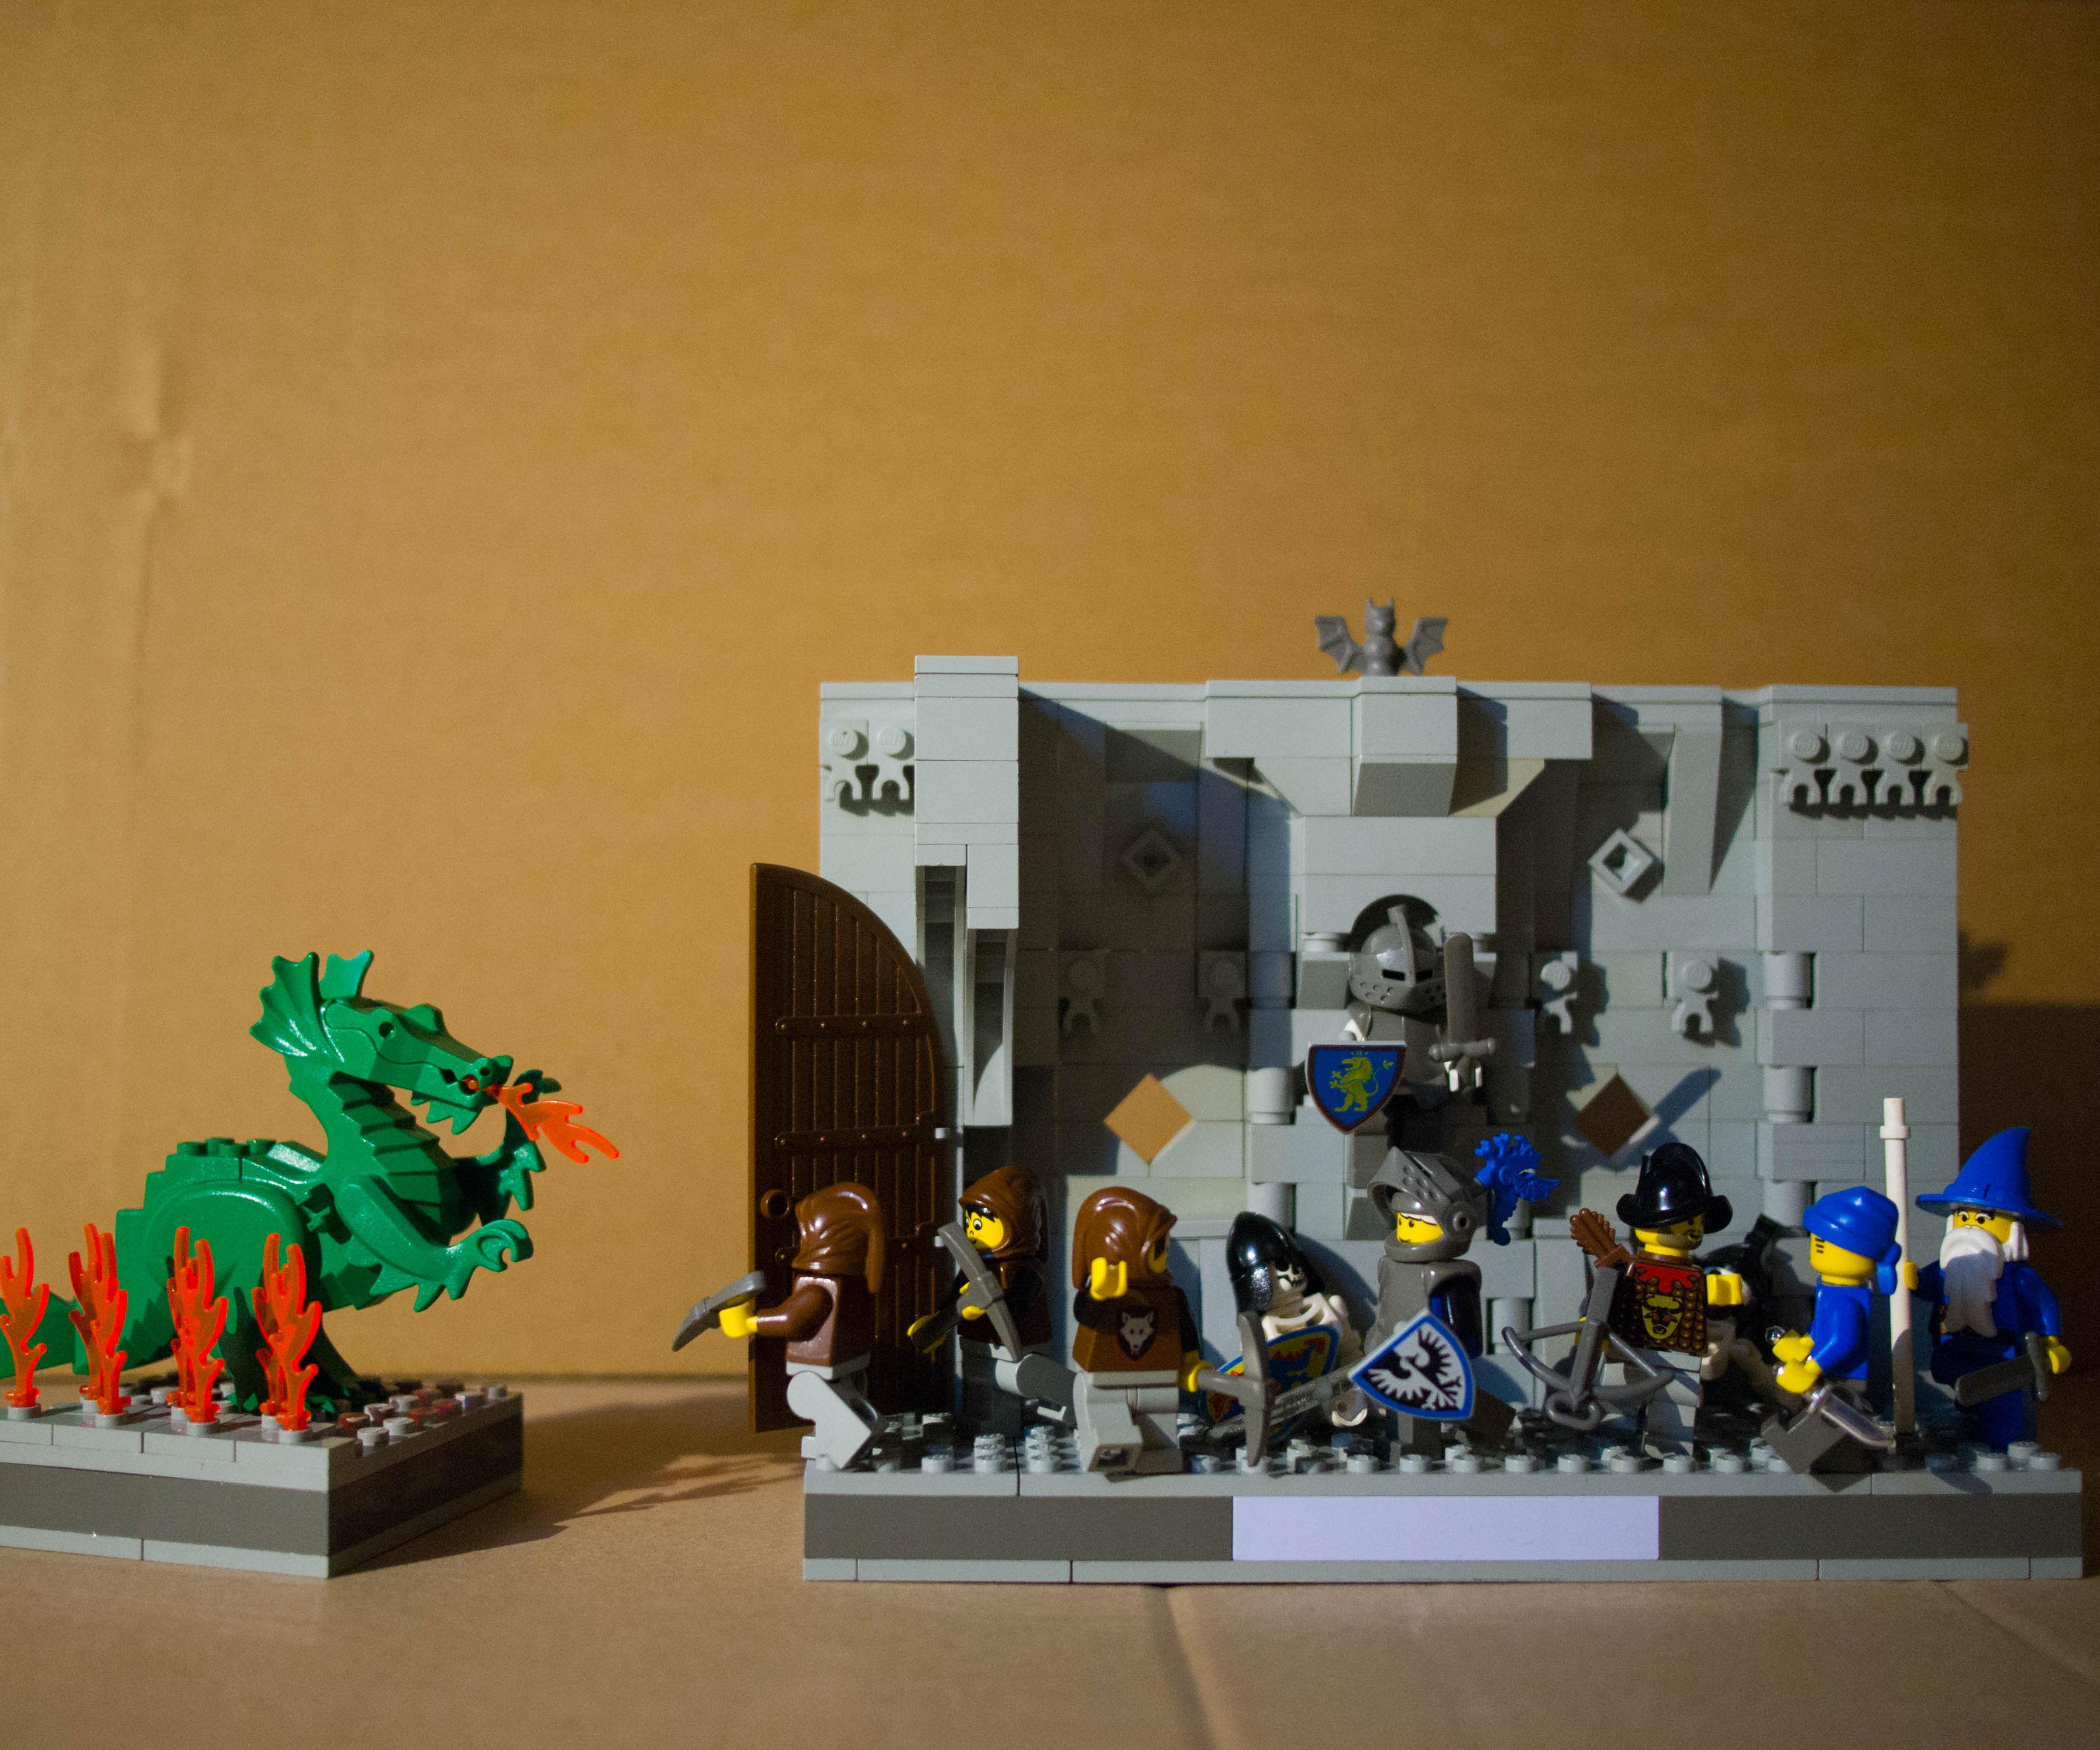 LEGO Dungeon Diorama